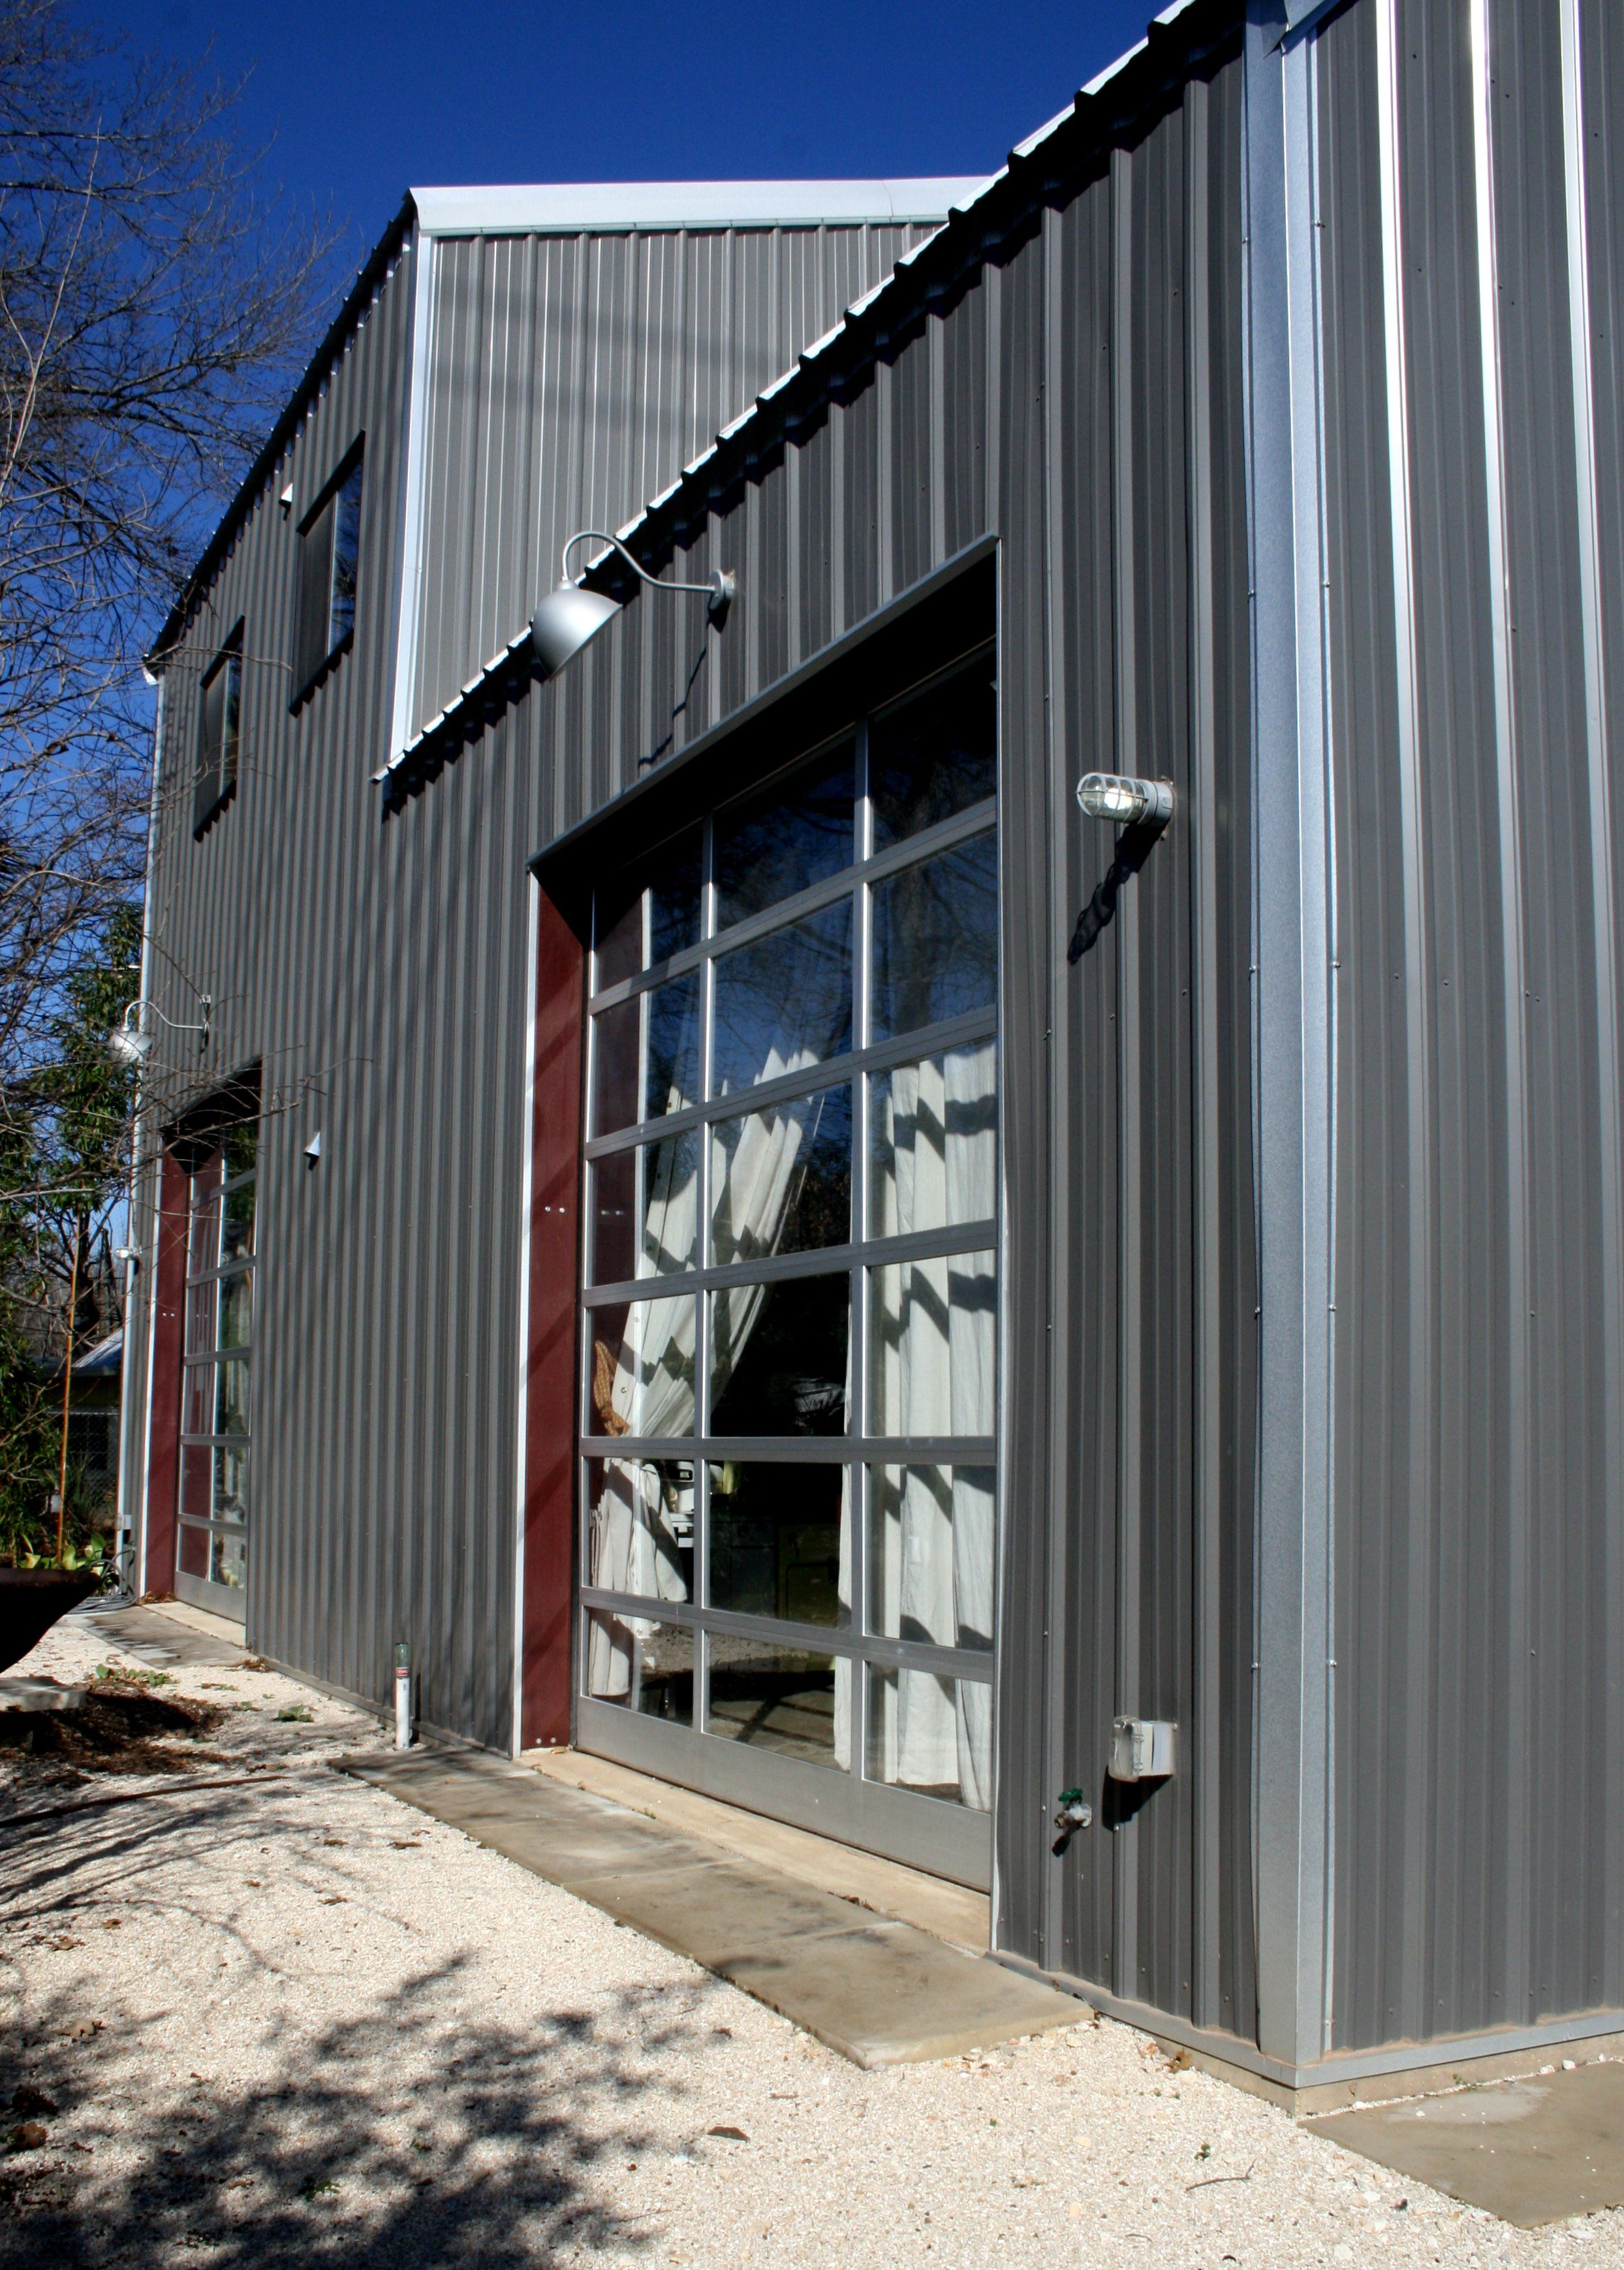 barn doors make garage door look ideas like